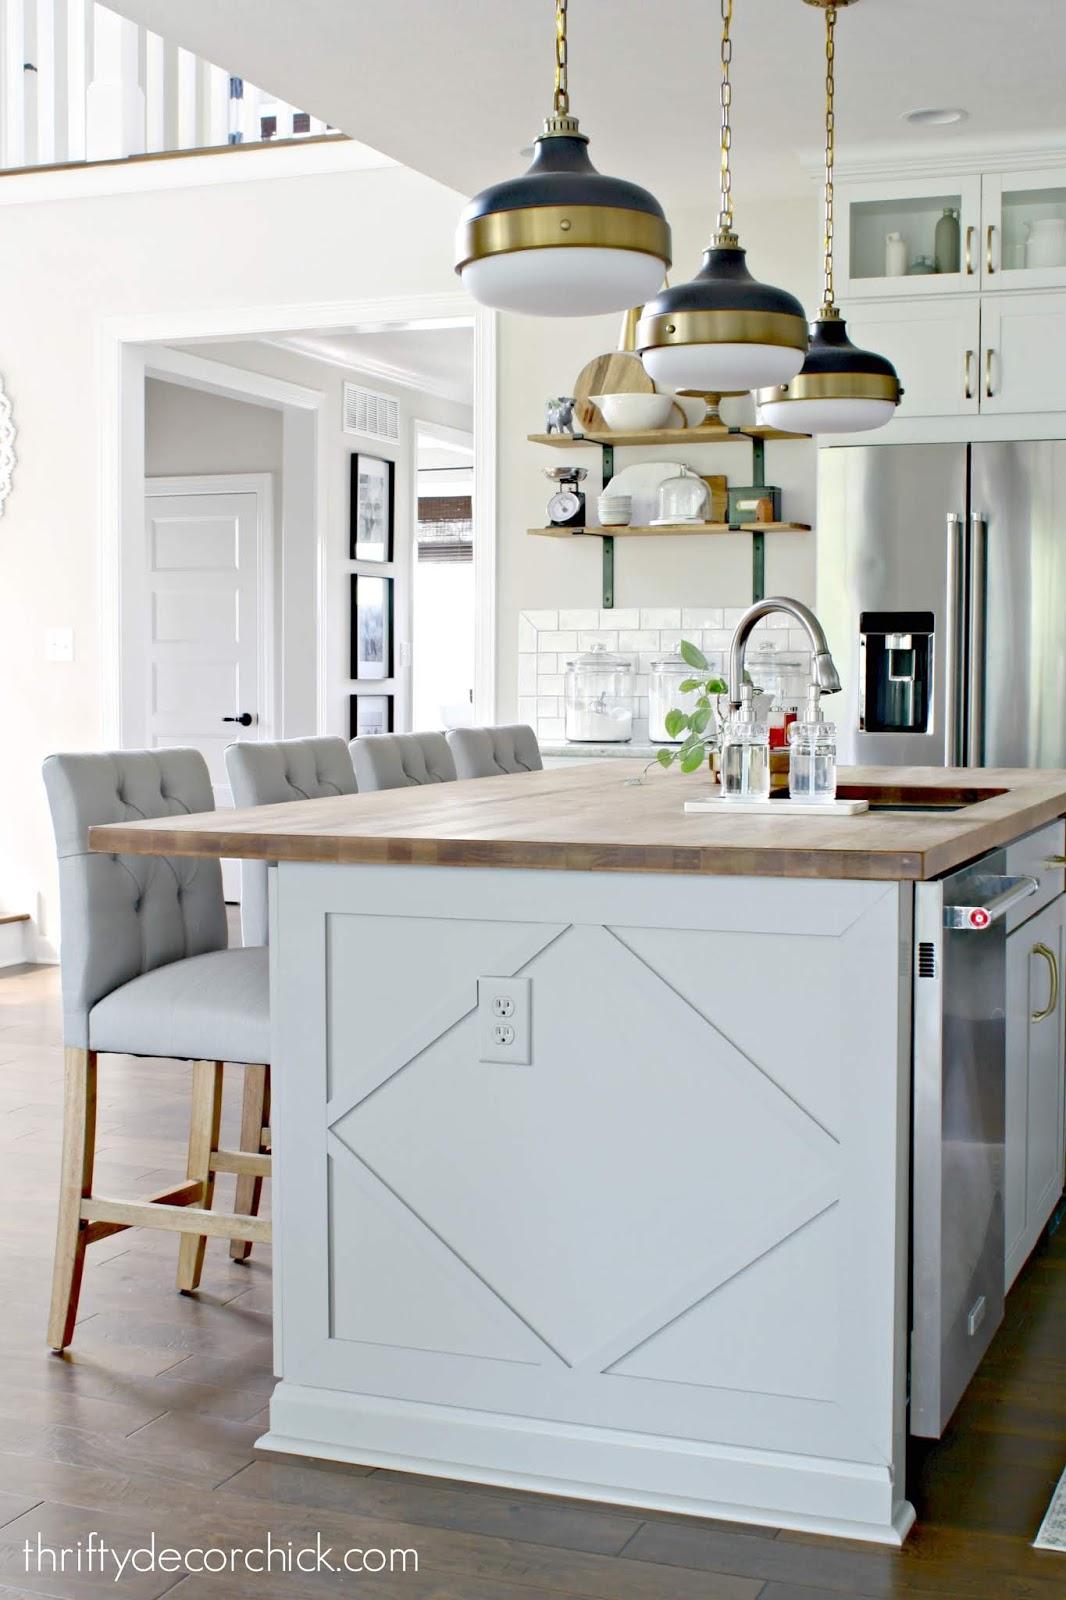 Adding custom detail to a plain kitchen island | Thrifty Decor Chick ...